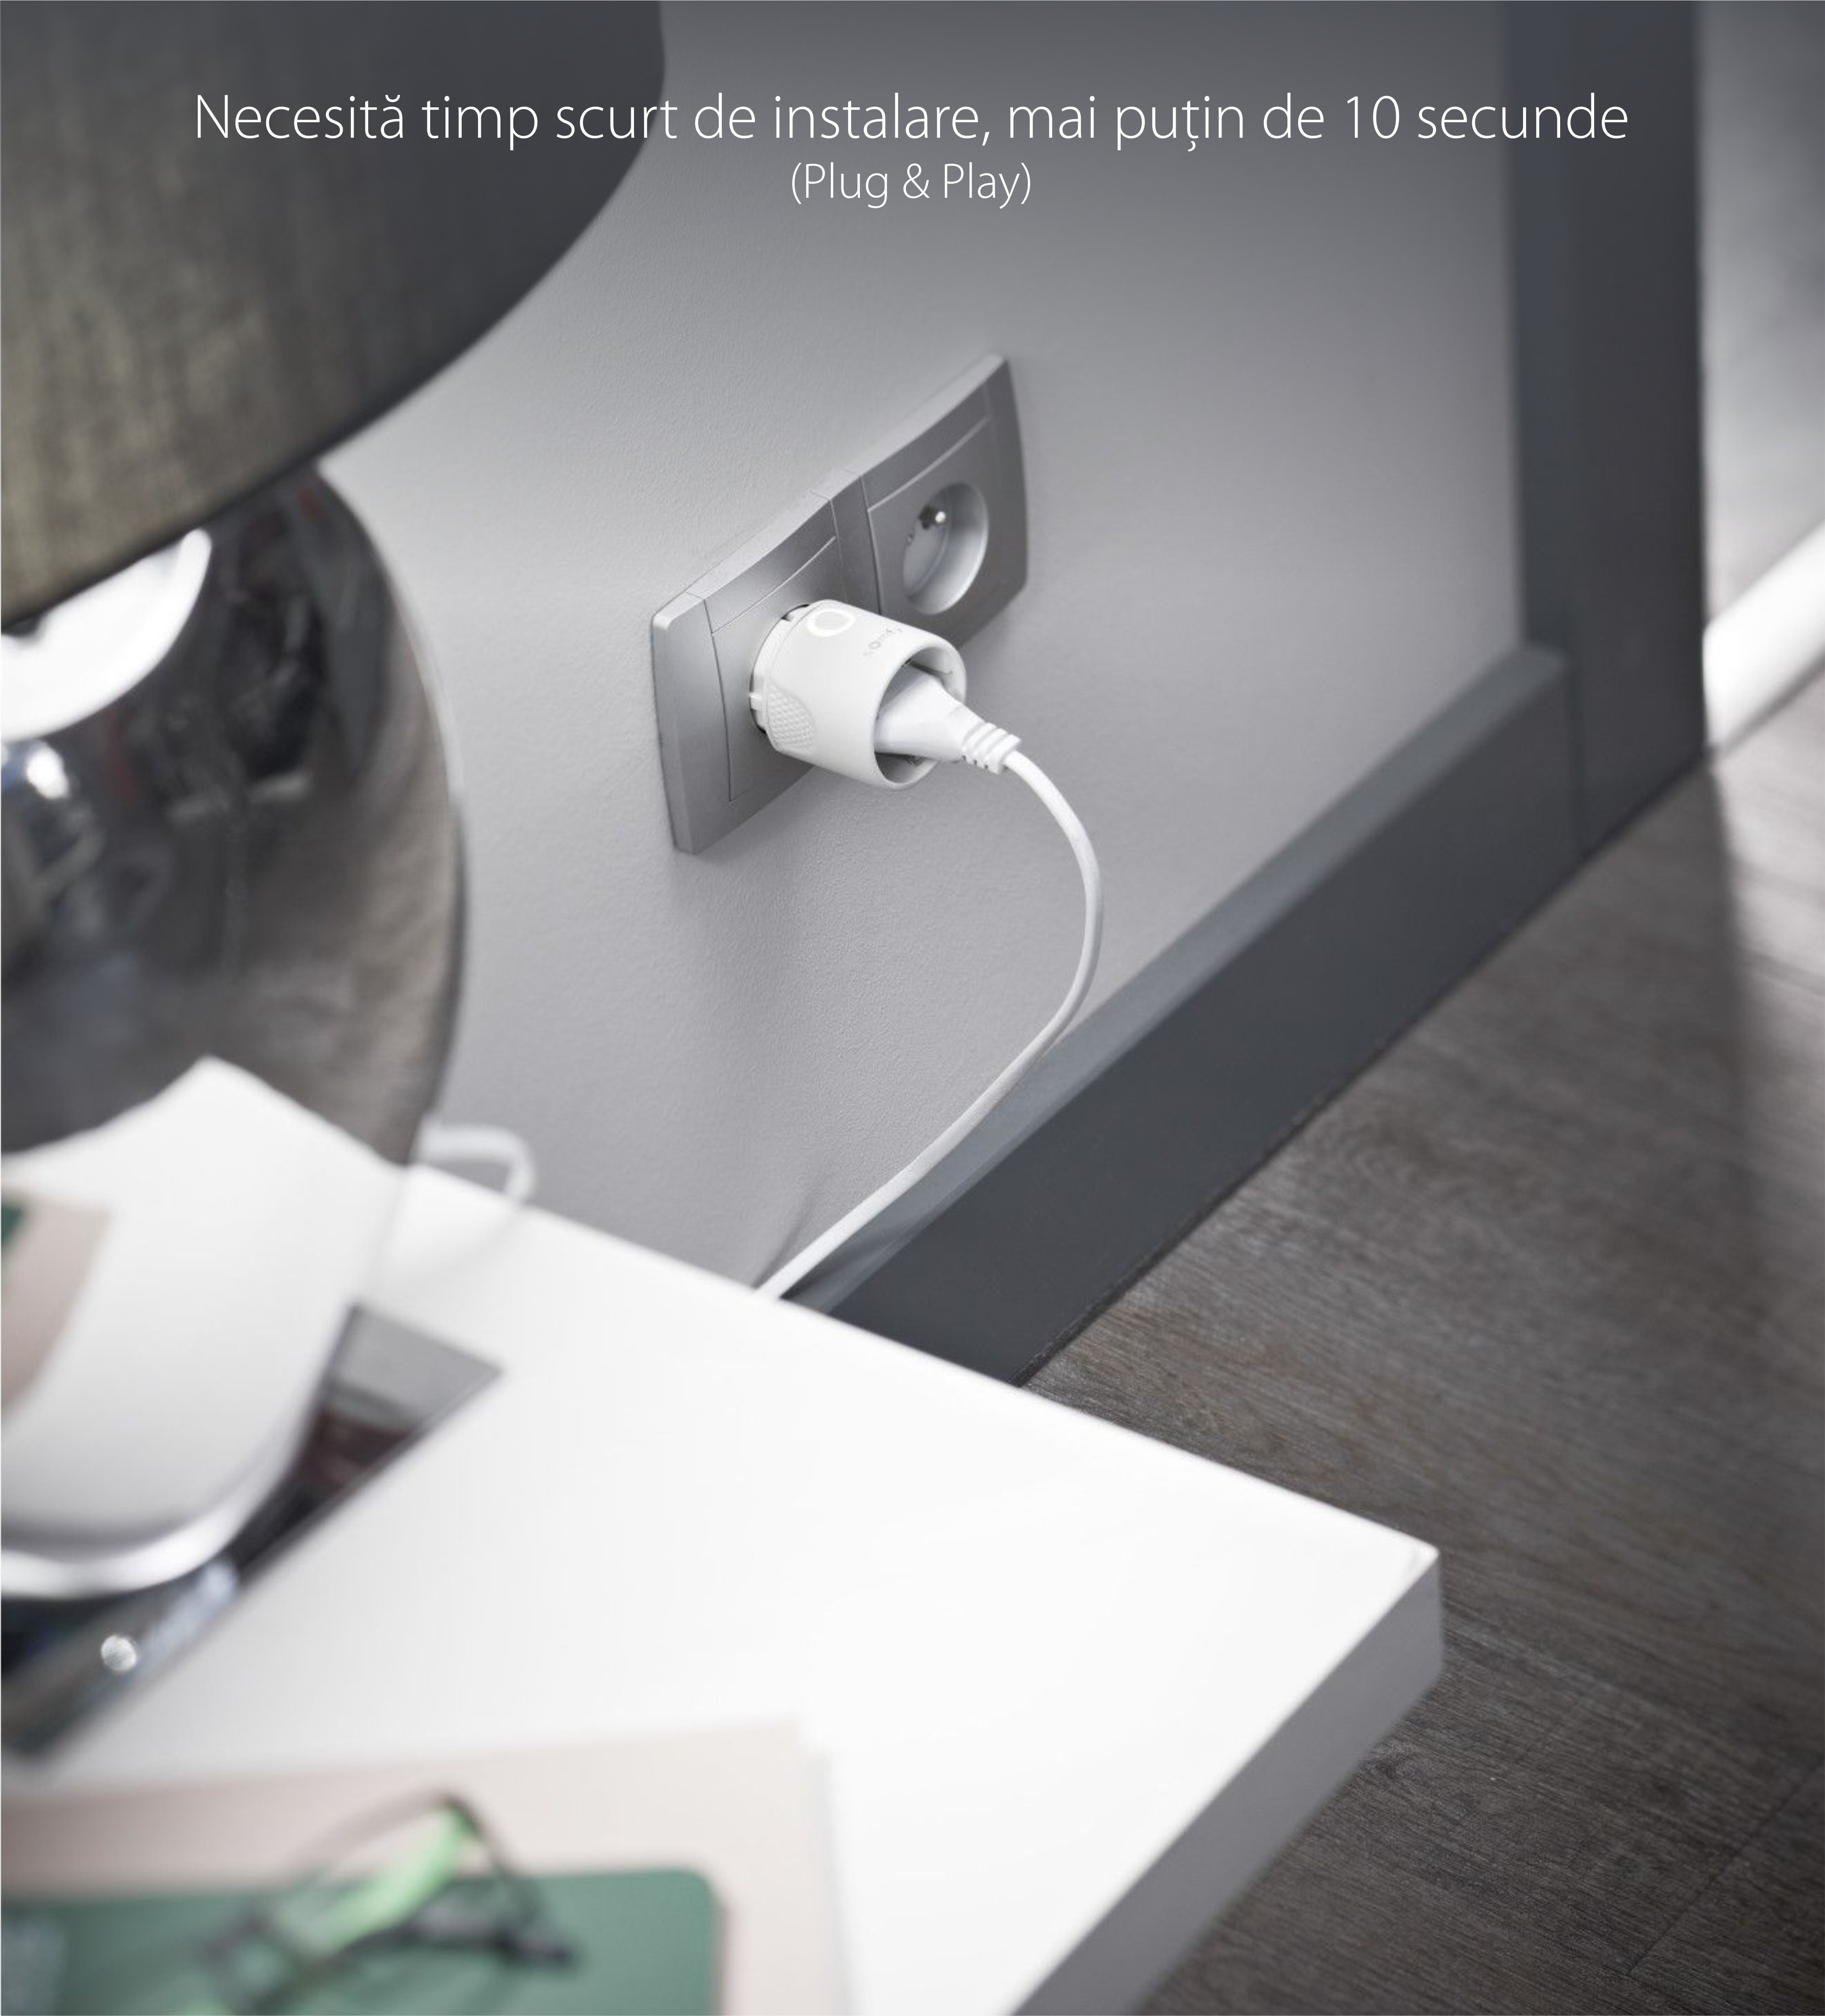 Priza inteligenta Somfy IO 230V, Plug & Play, Tip F, Compatibil cu TaHoma, Connexoon io, a Telecomenzilor  si Videointerfoanelor io-homecontrol